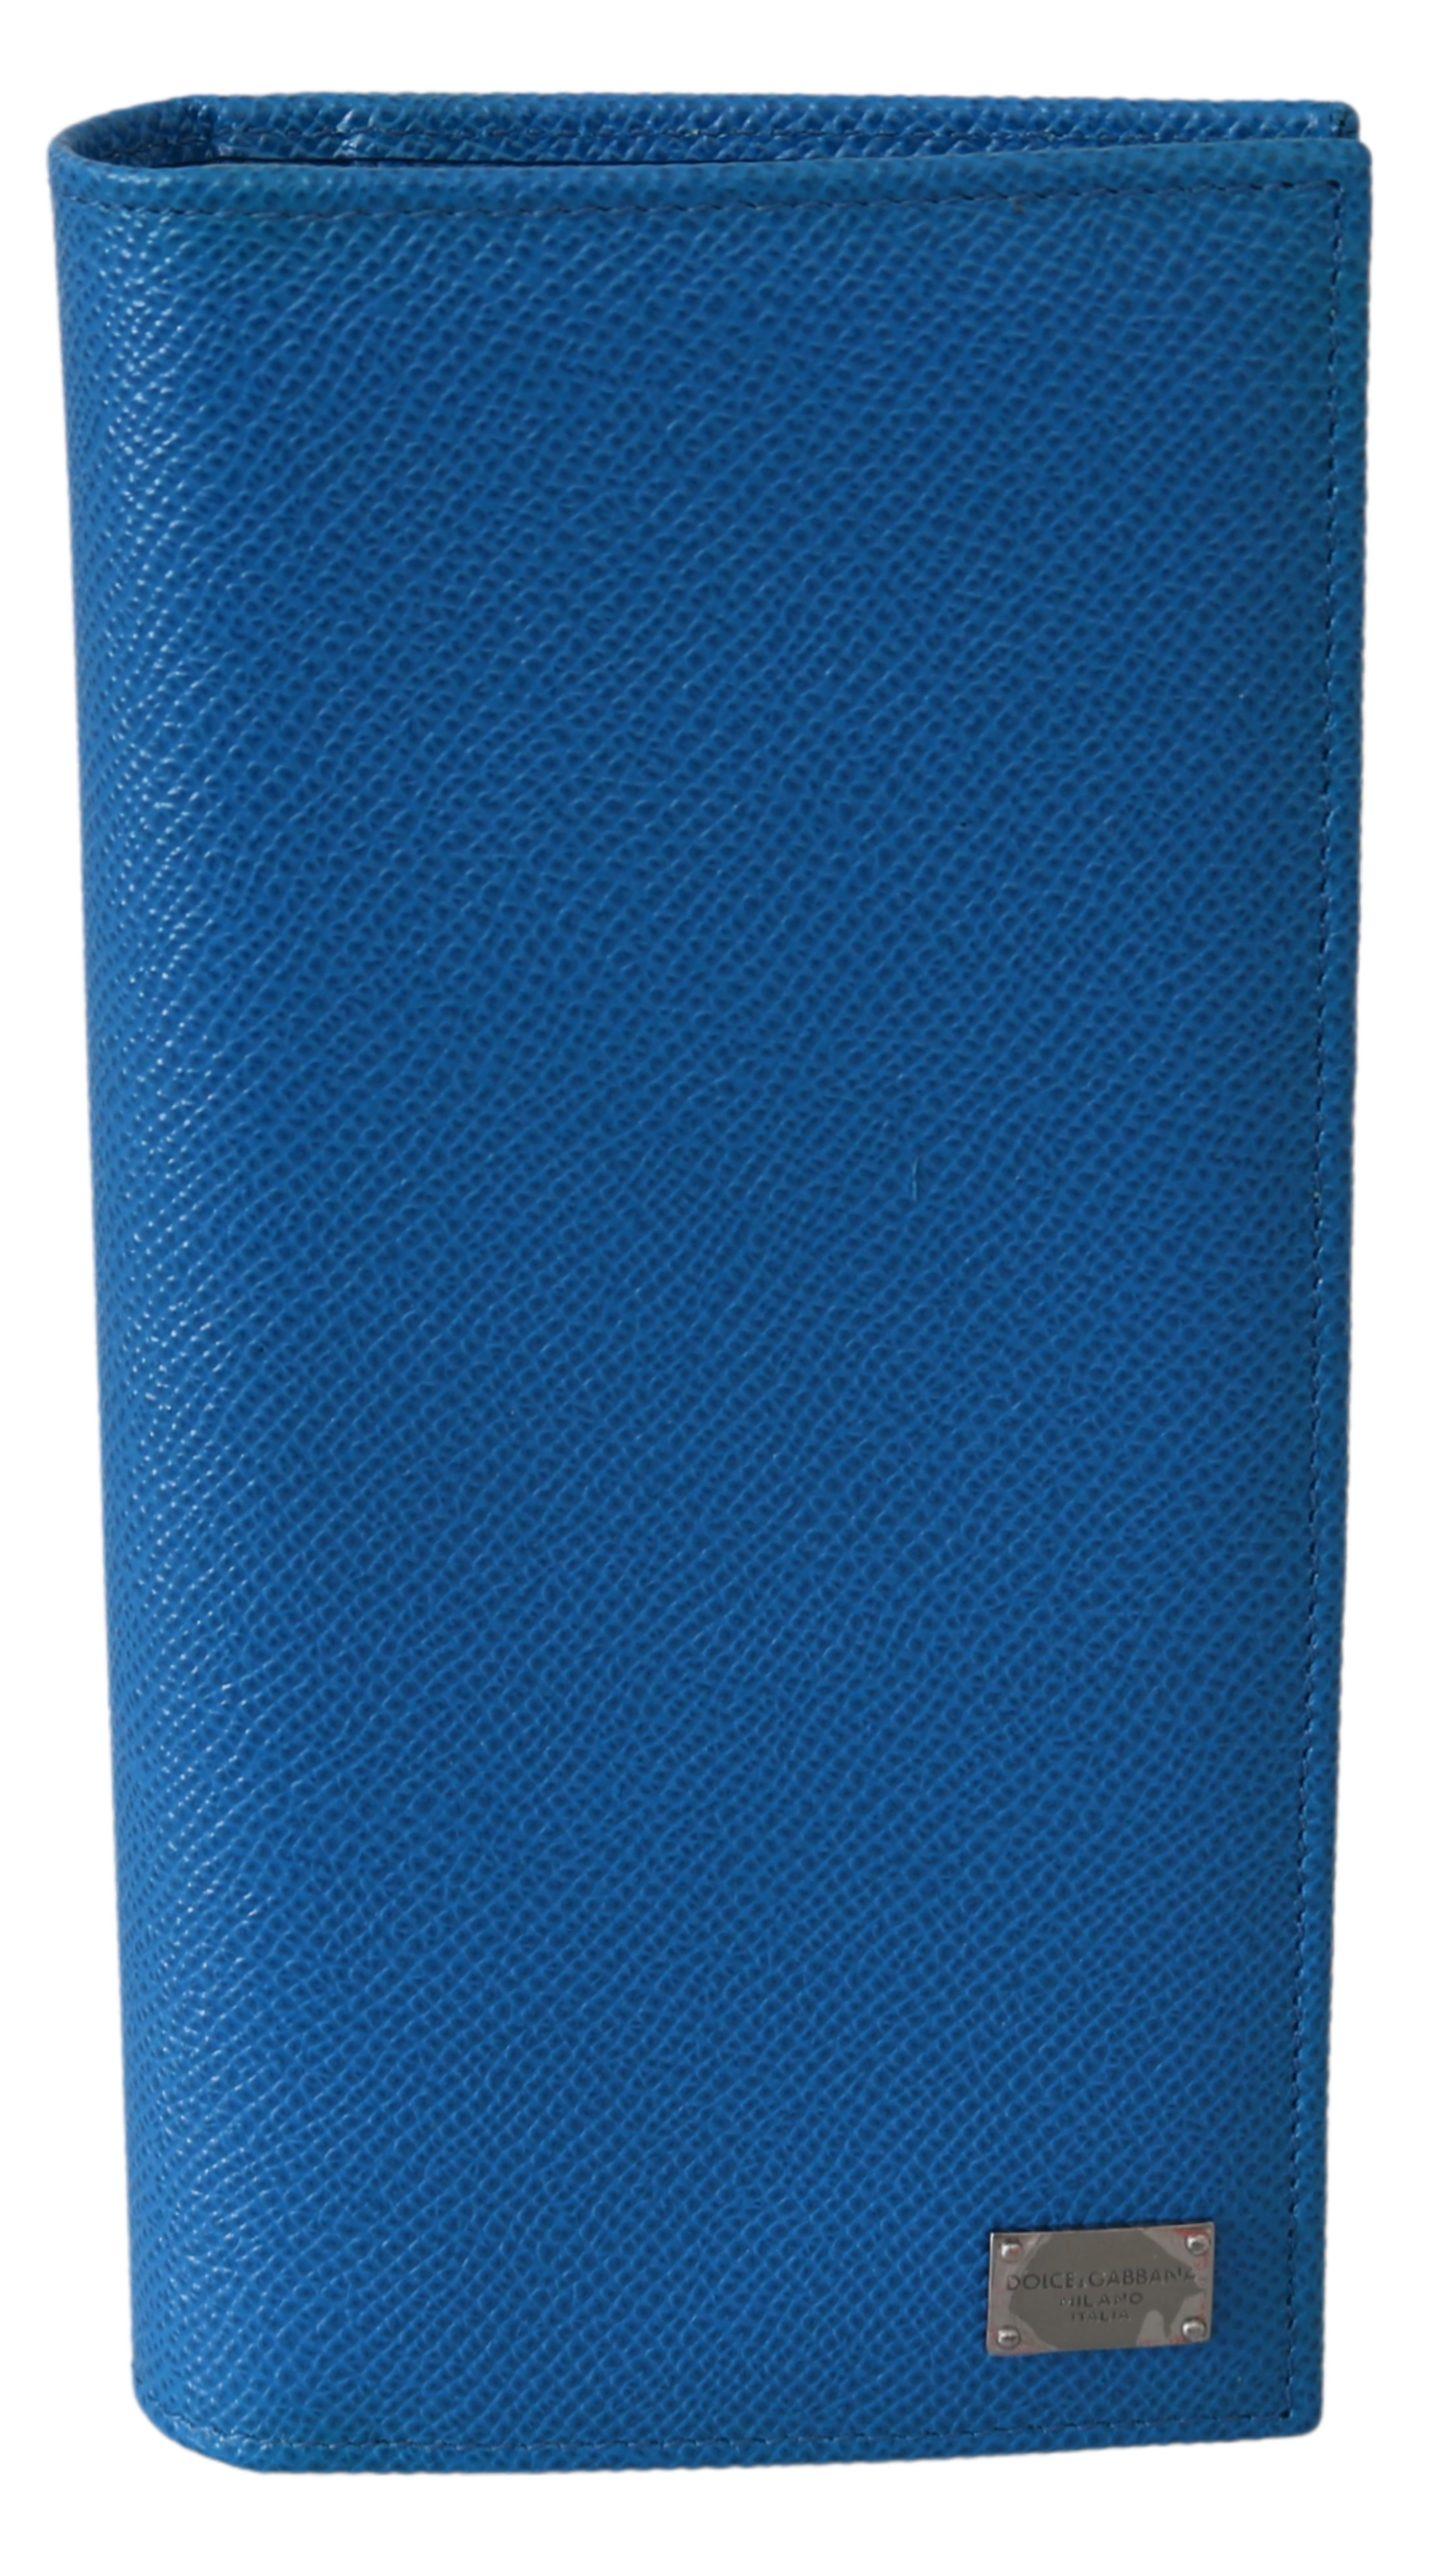 Dolce & Gabbana Men's Solid Bifold Card Holder Leather Wallet White VAS9579